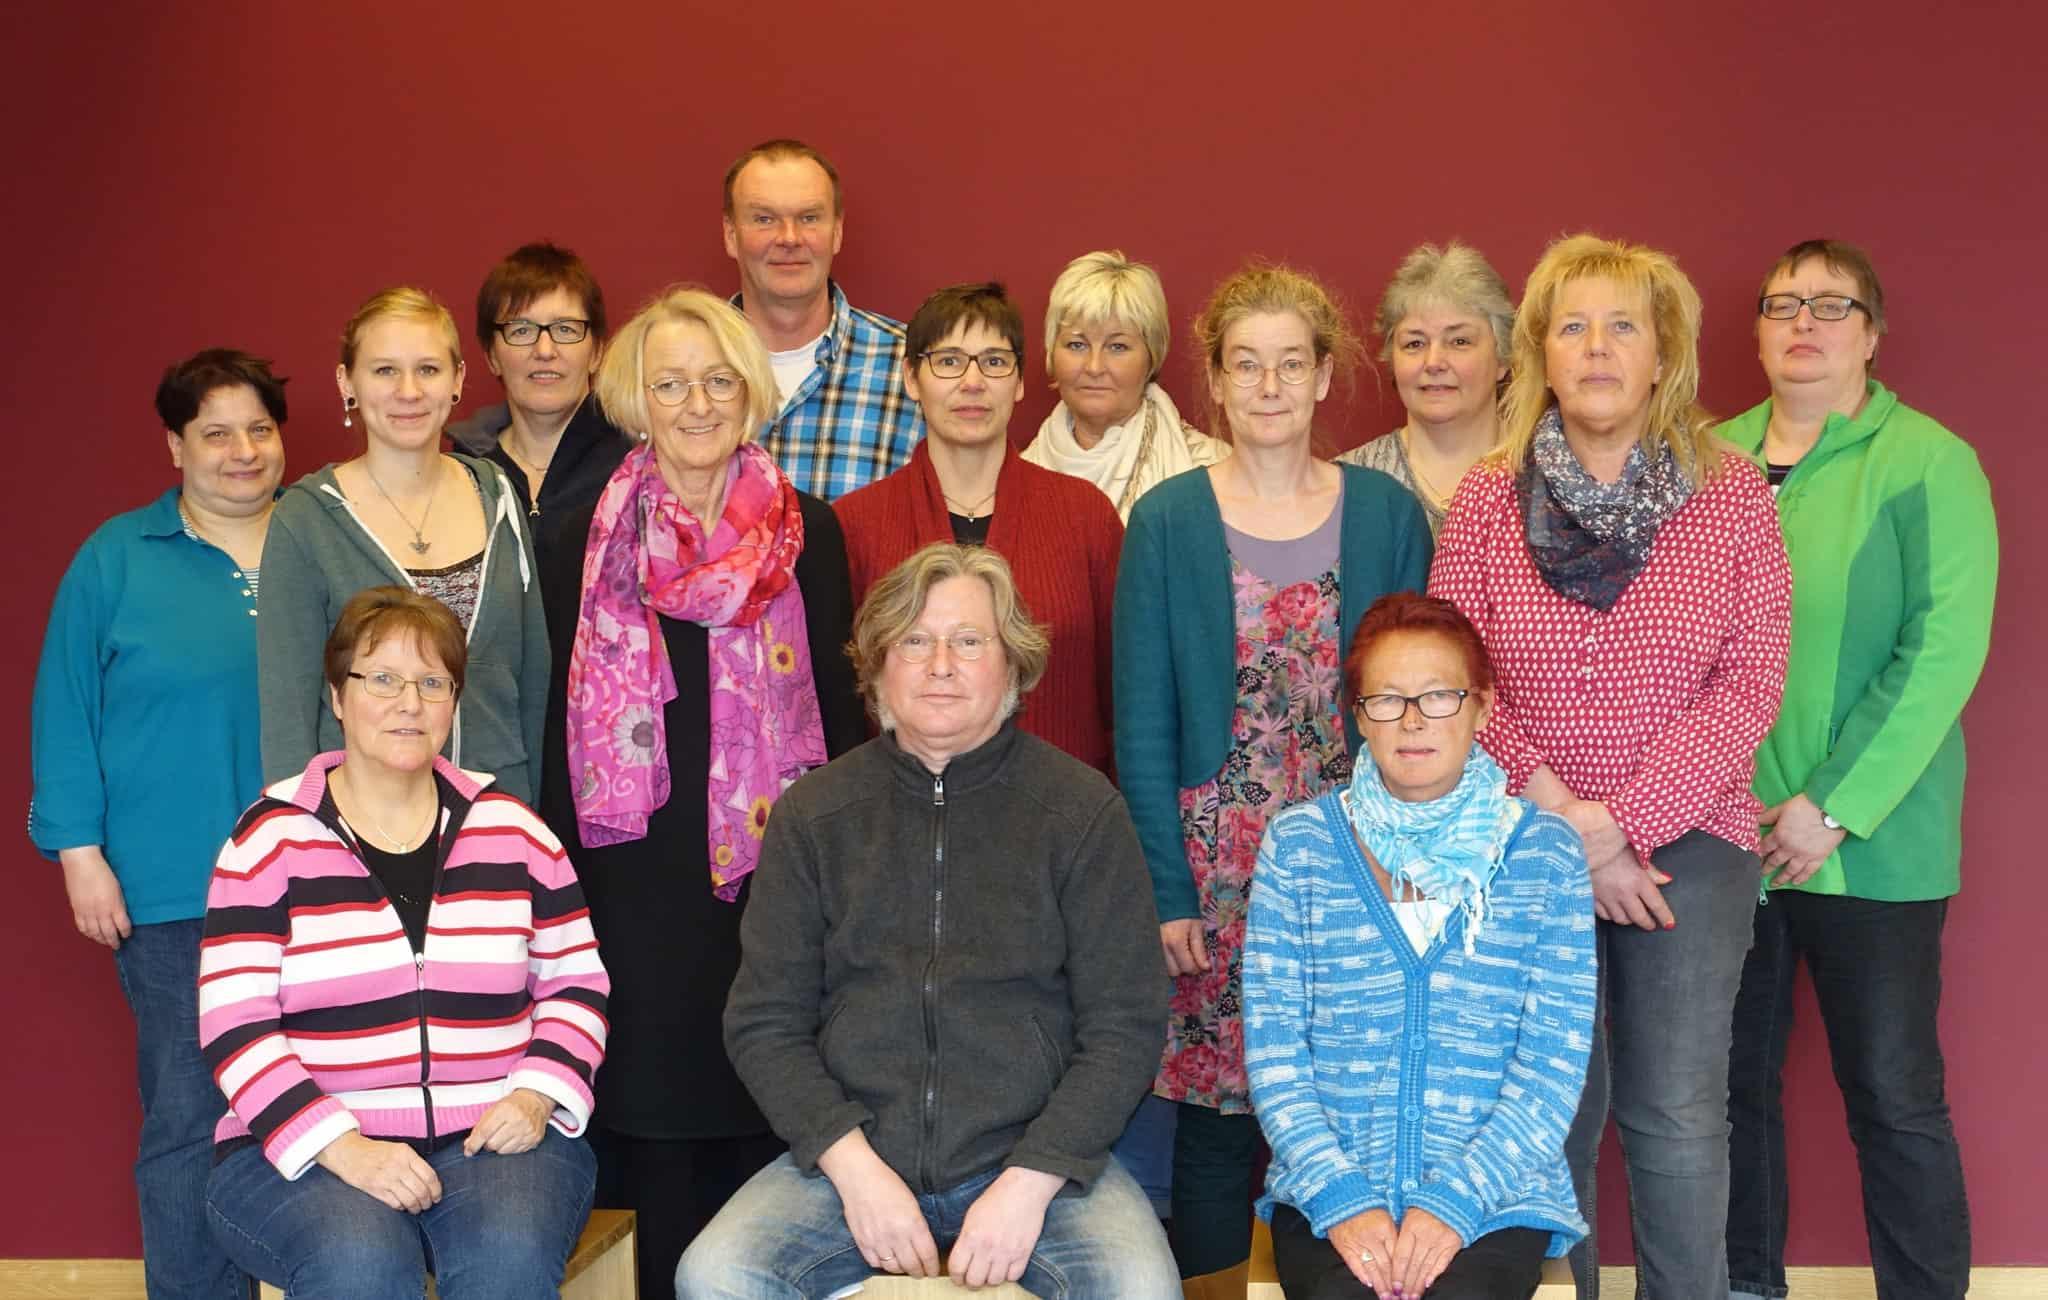 Team Haus Meedland